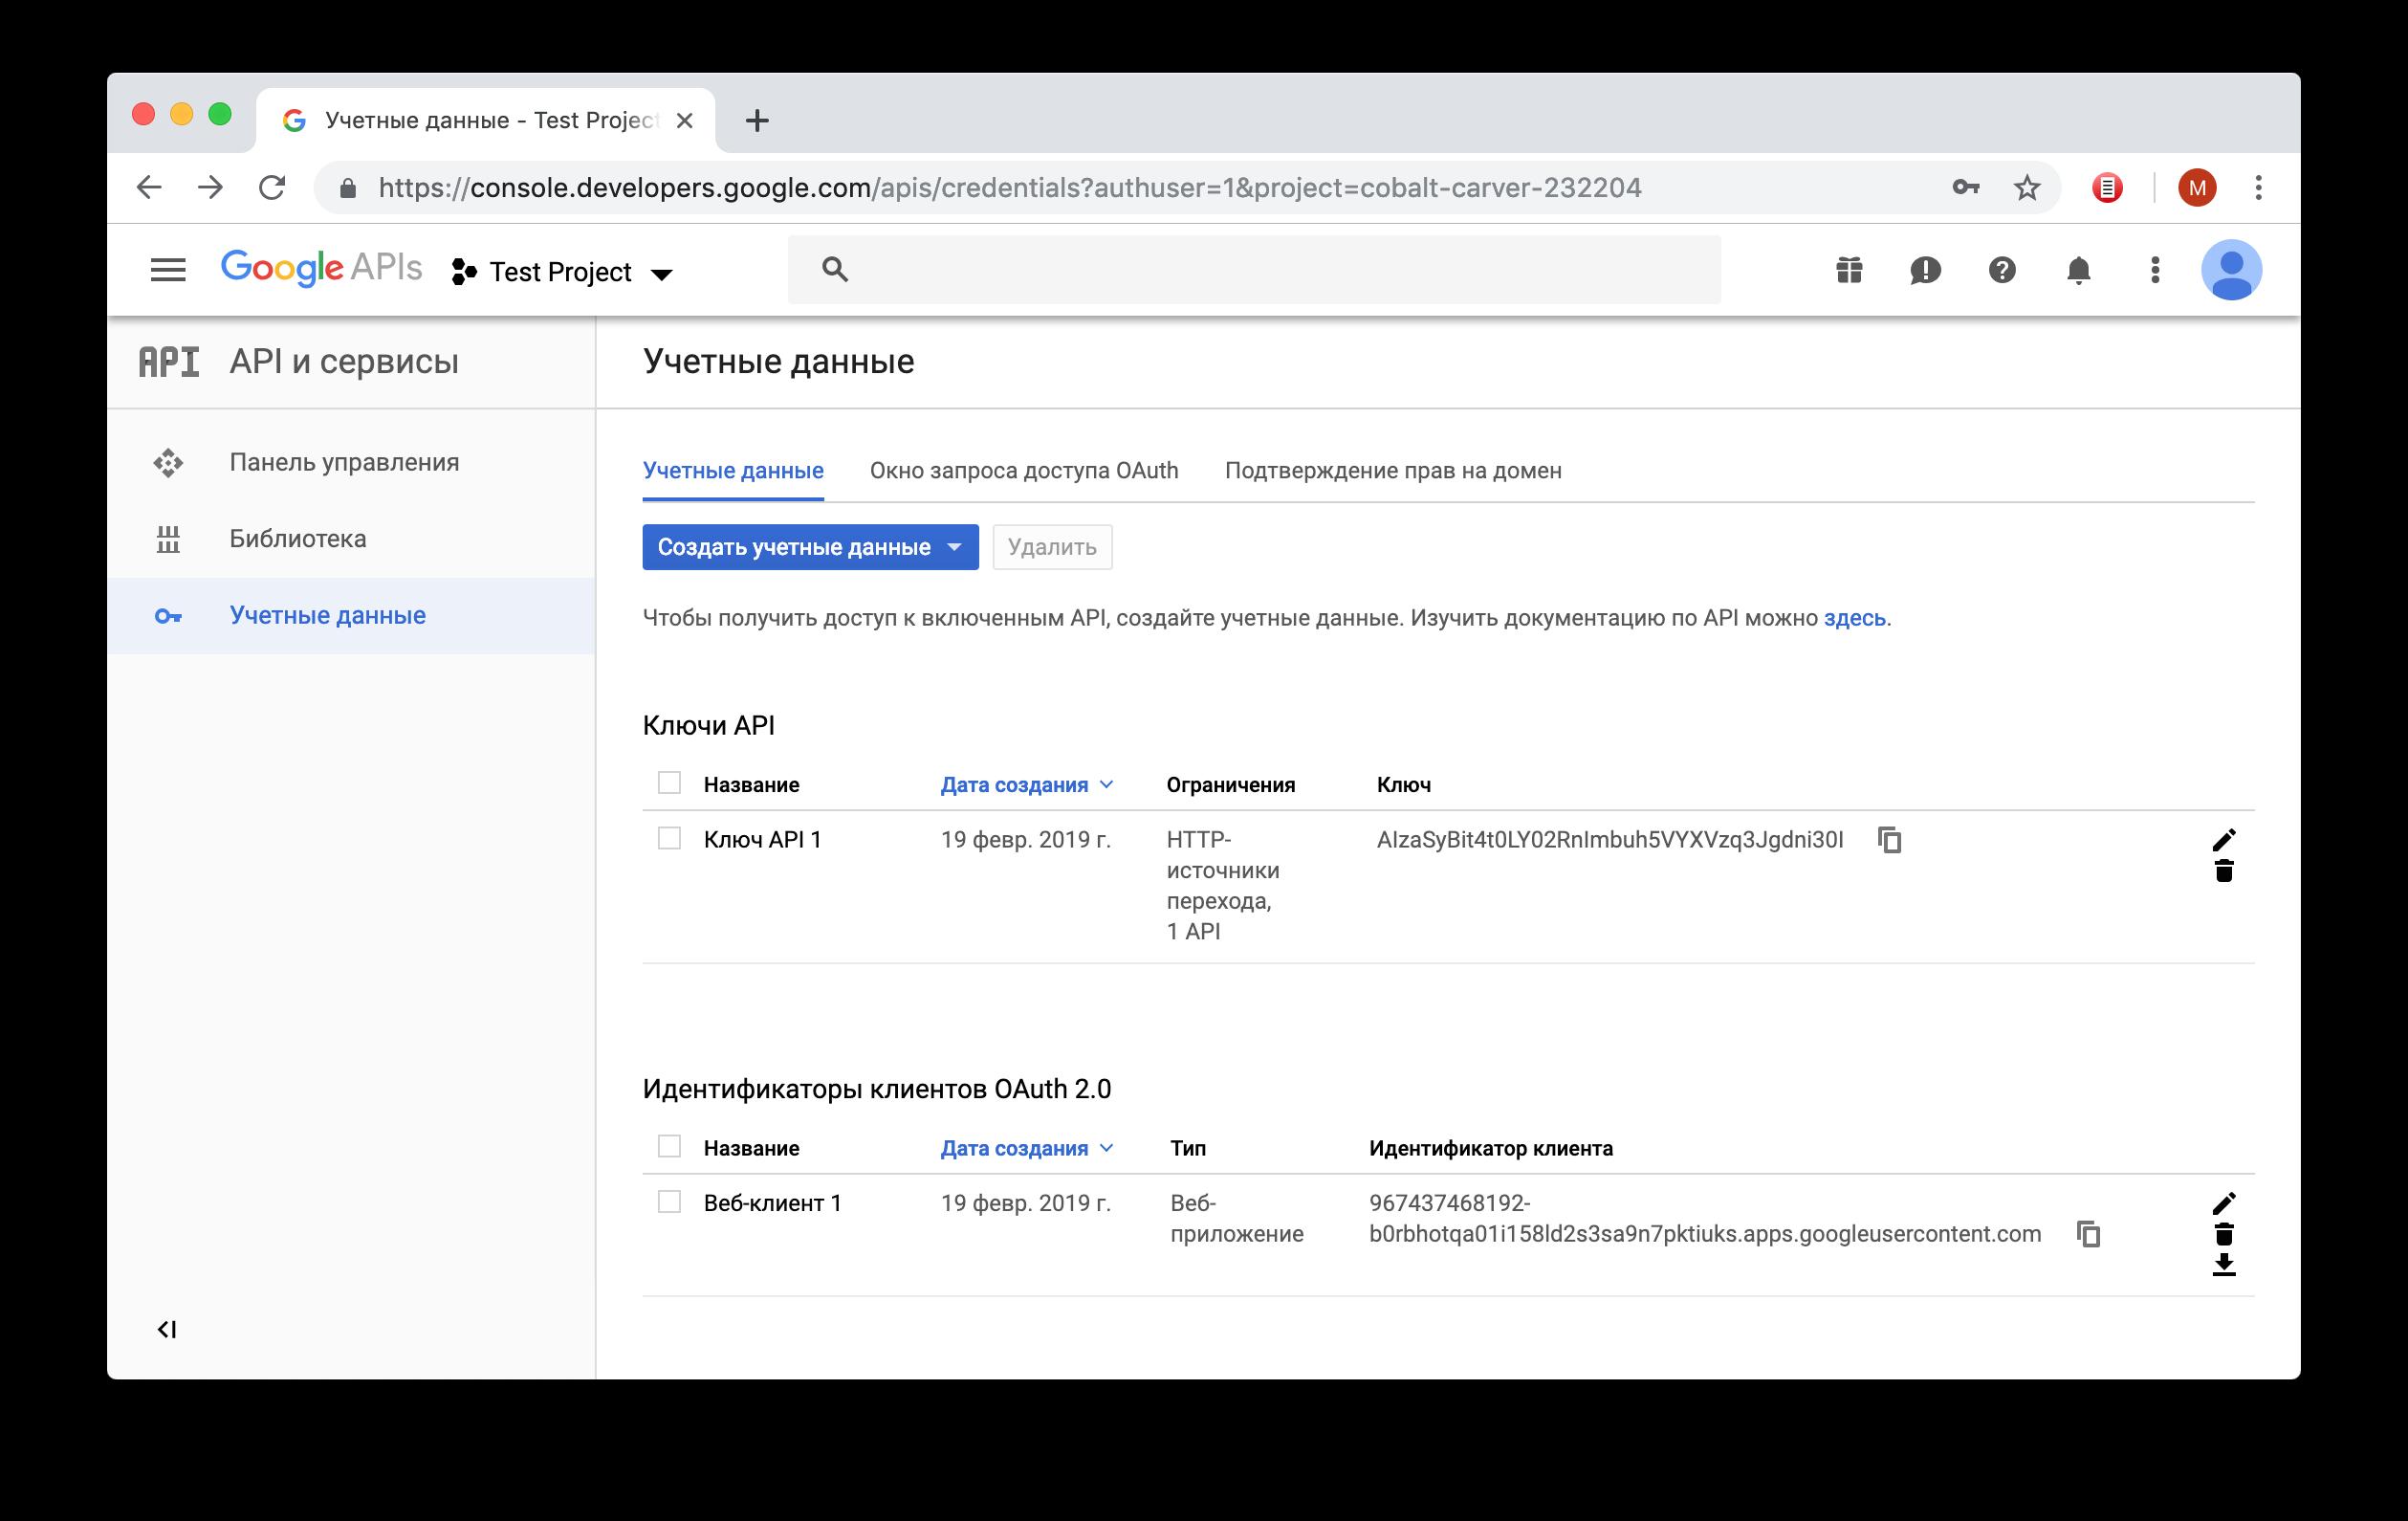 Google Drive как хранилище для веб-приложения - 3